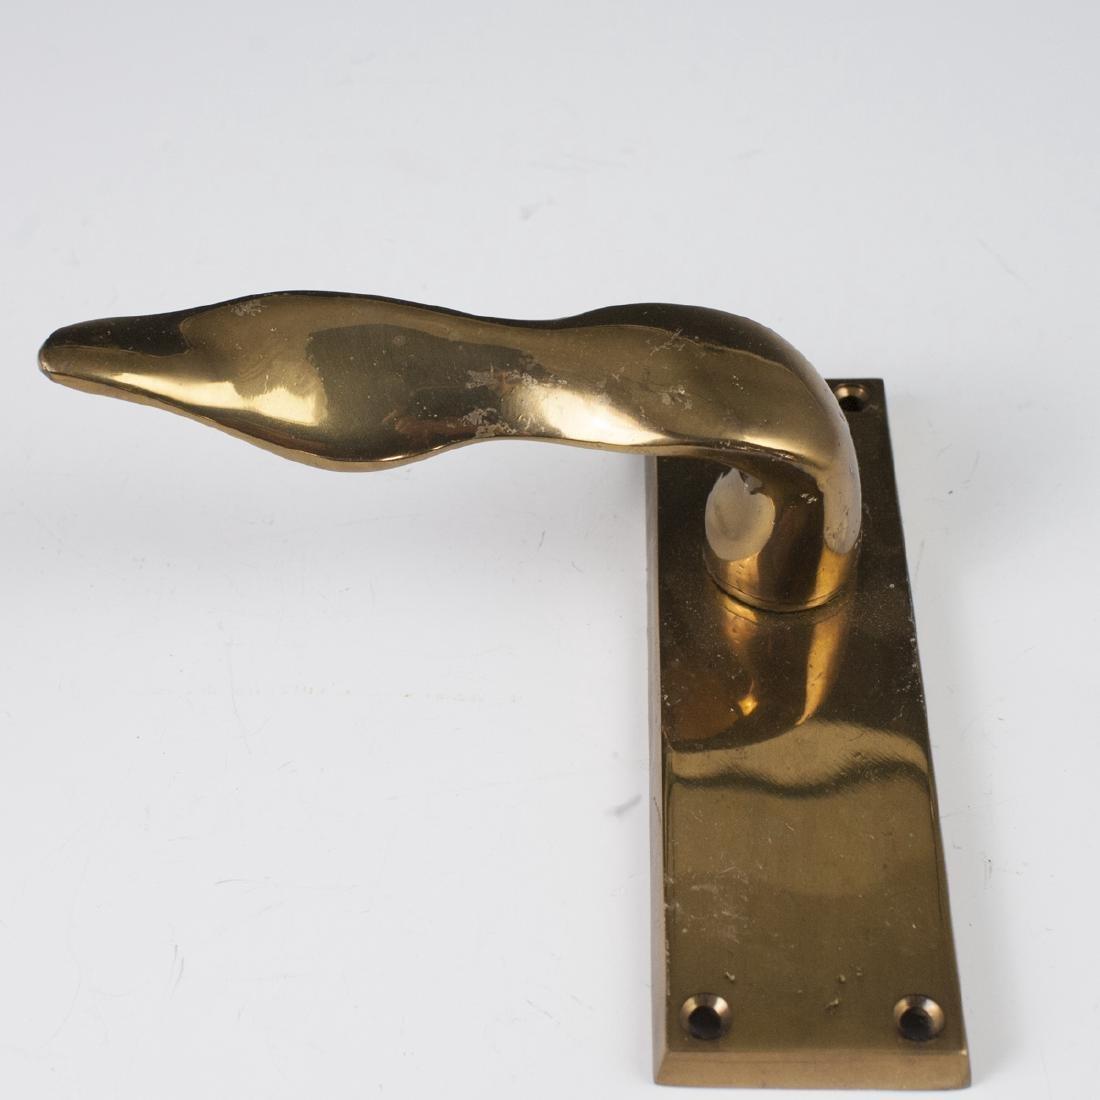 David Marshall Brass Door Knobs - 3